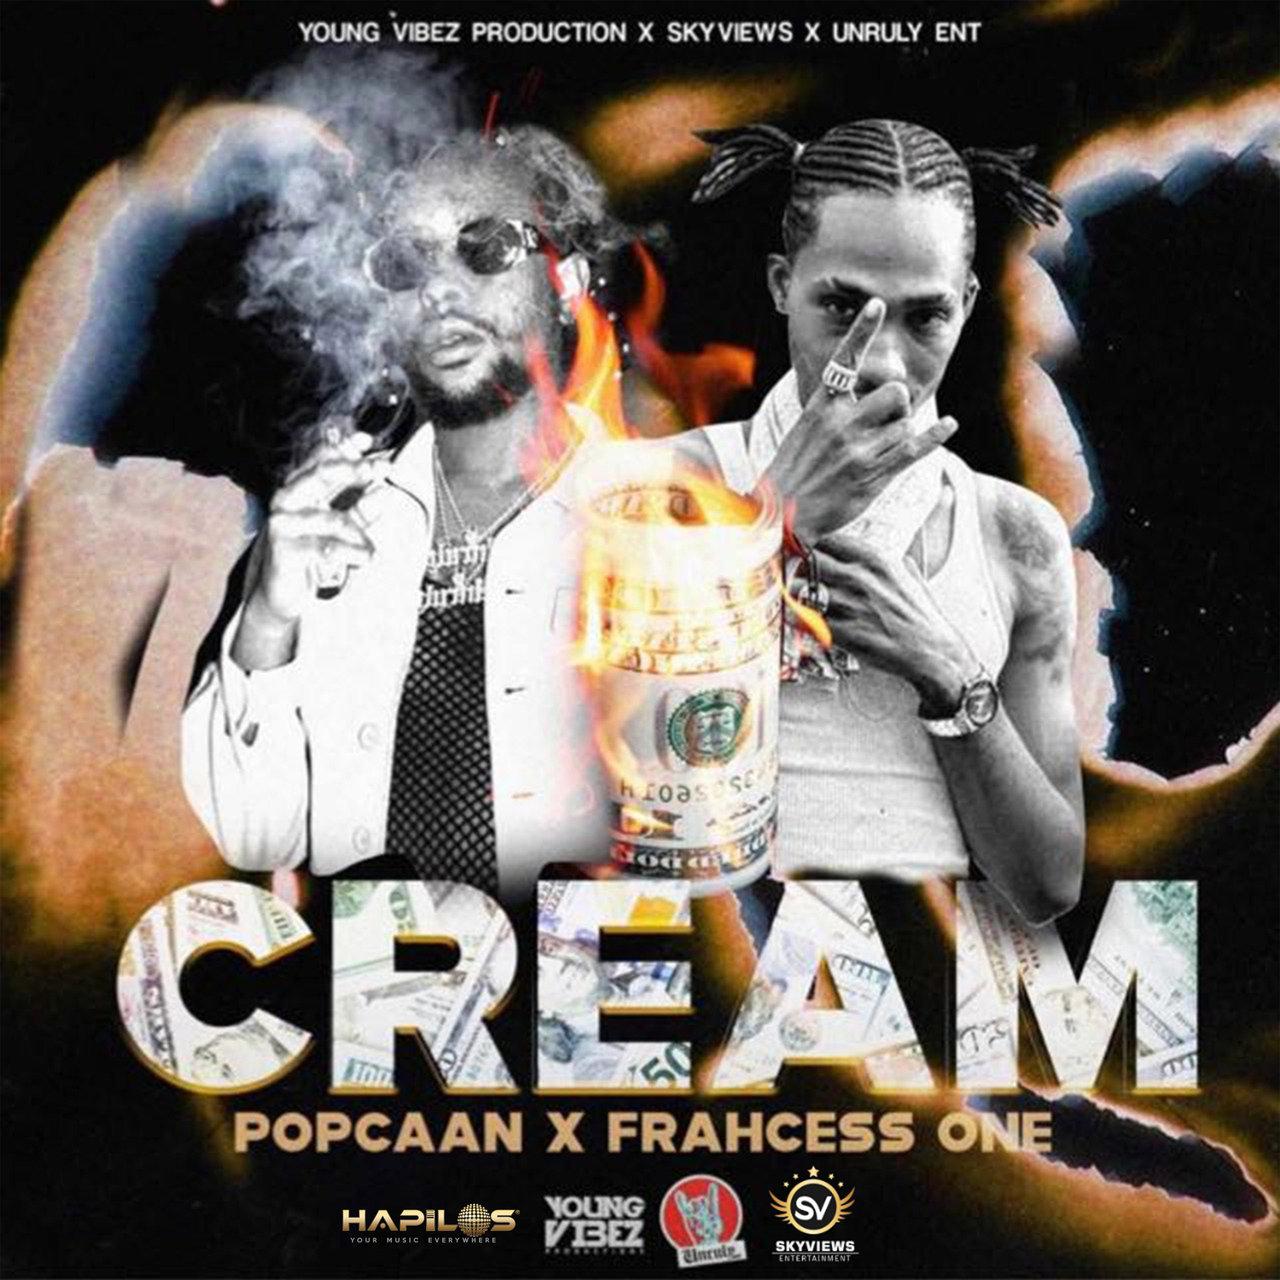 Popcaan - Cream (ft. Frahcess One) (Cover)